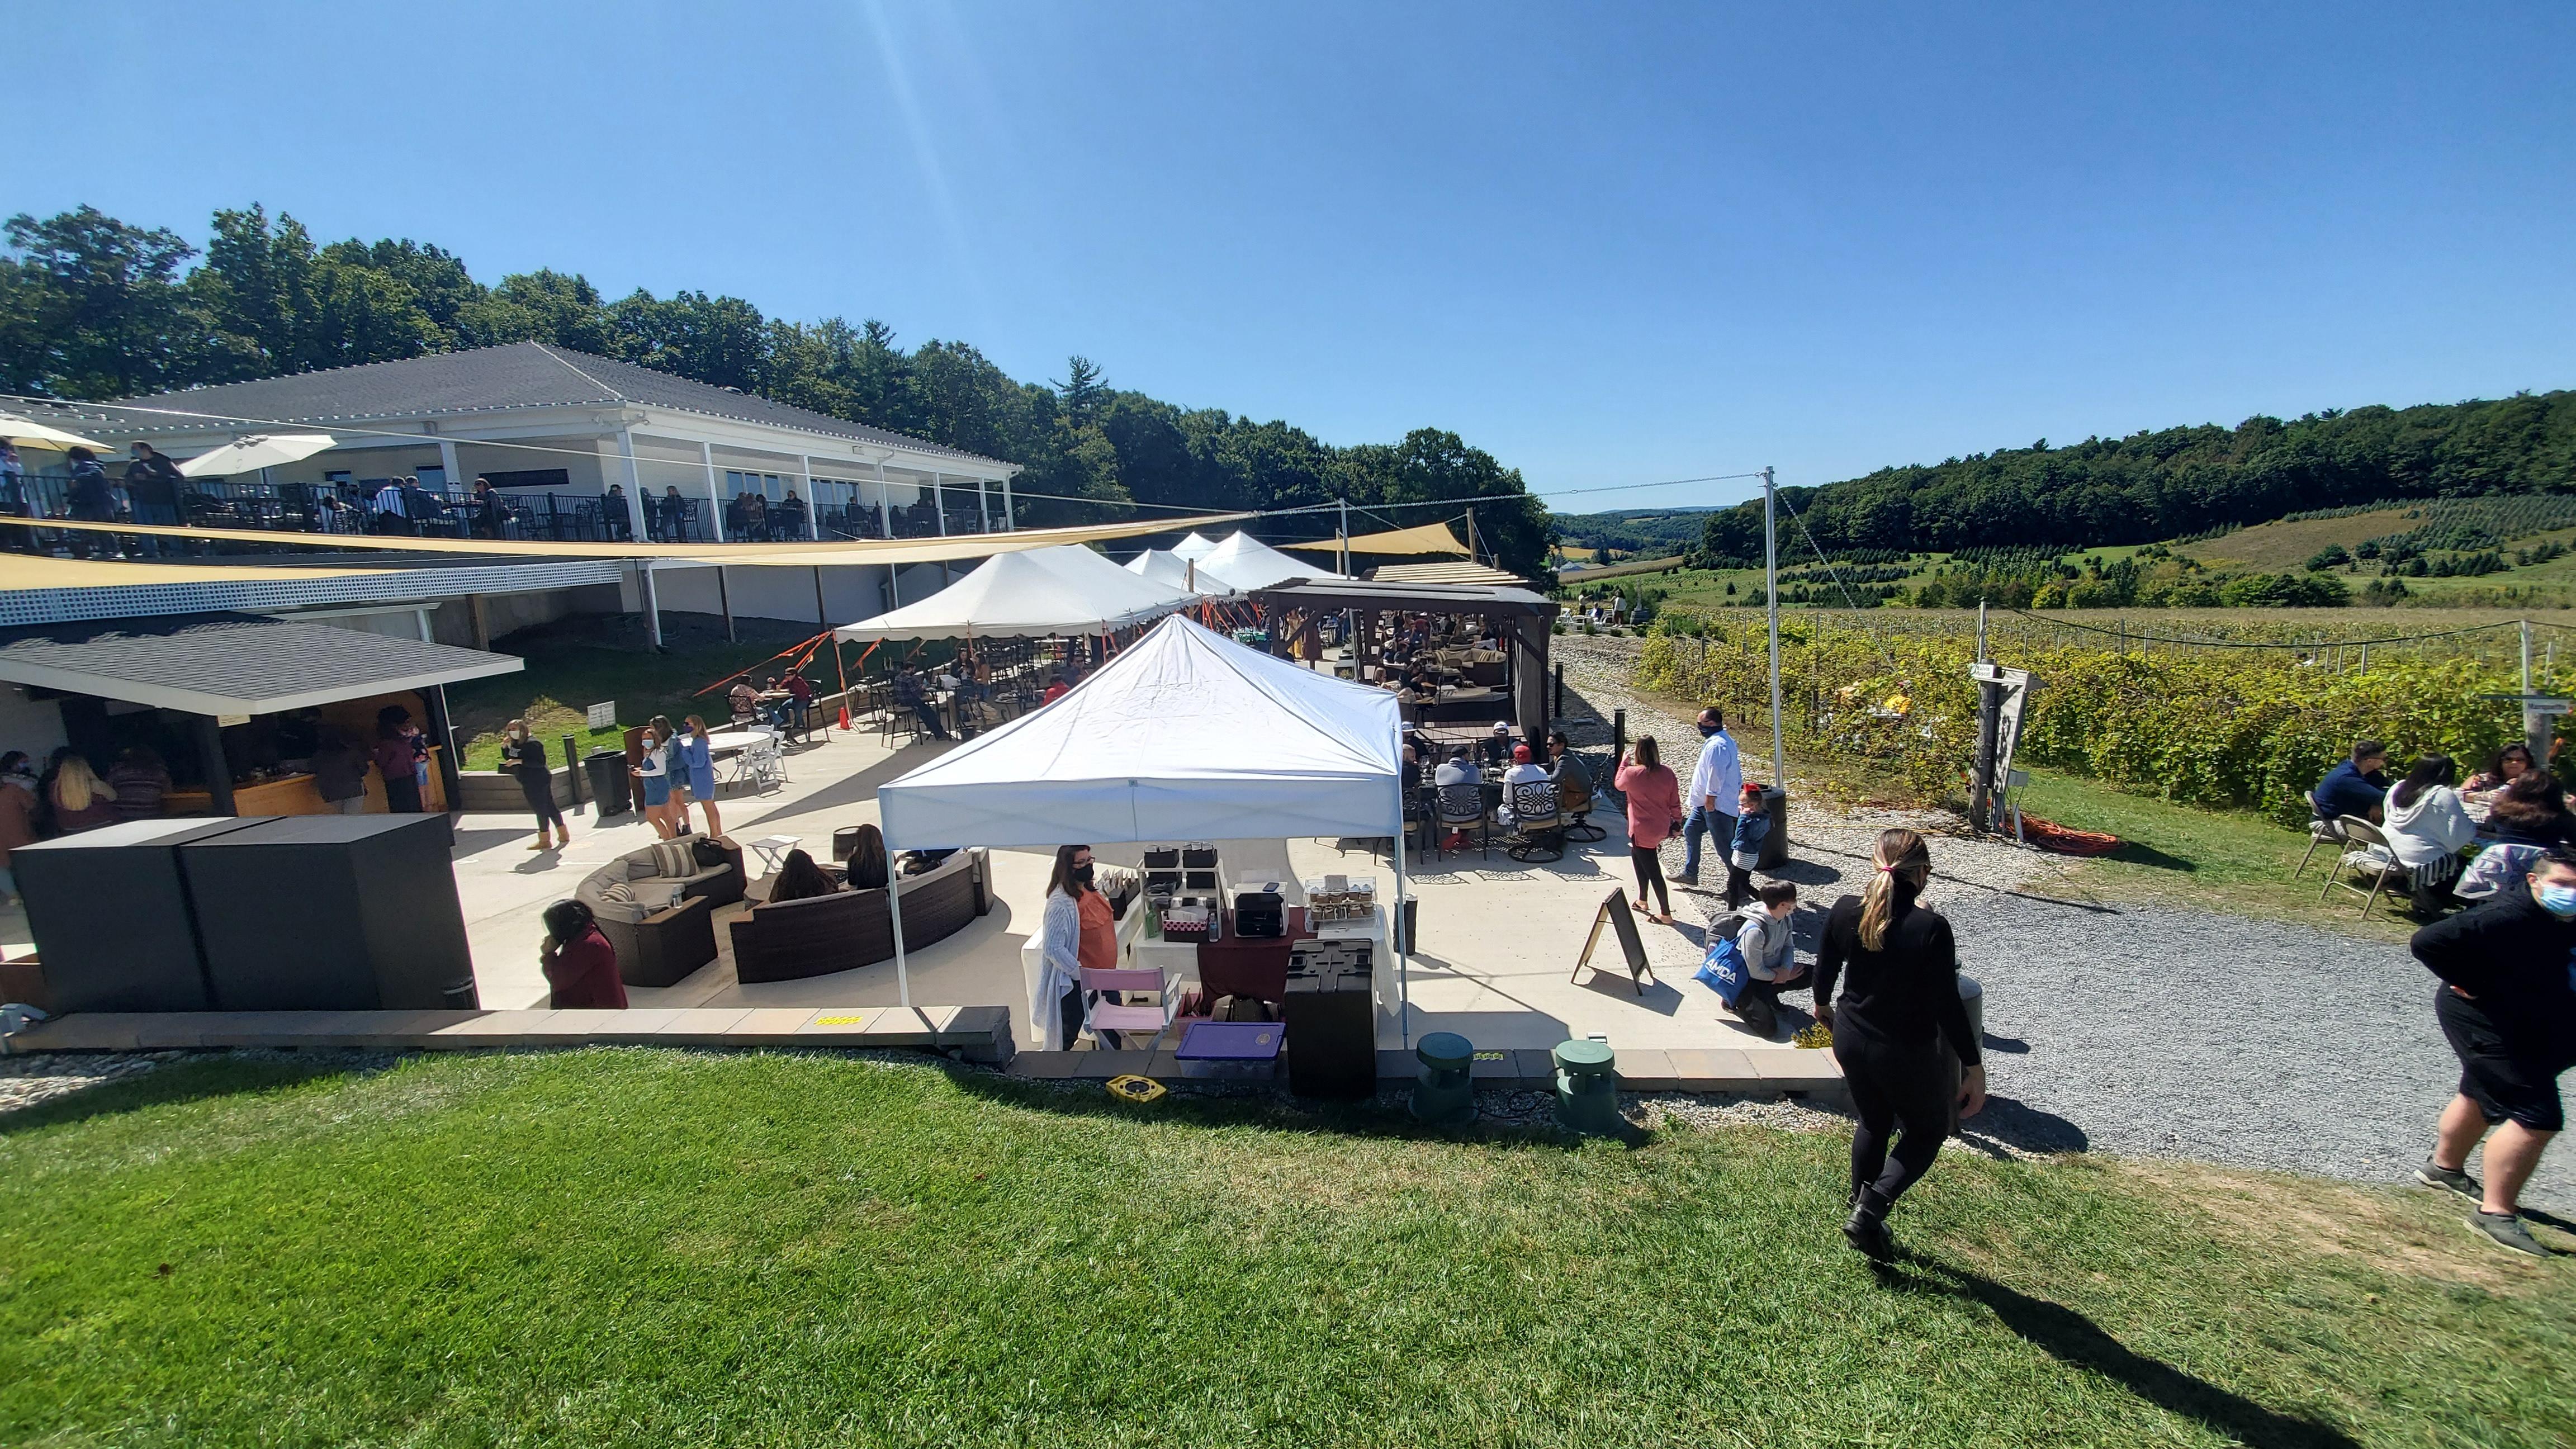 Blue Ridge Vineyards Poconos PA review